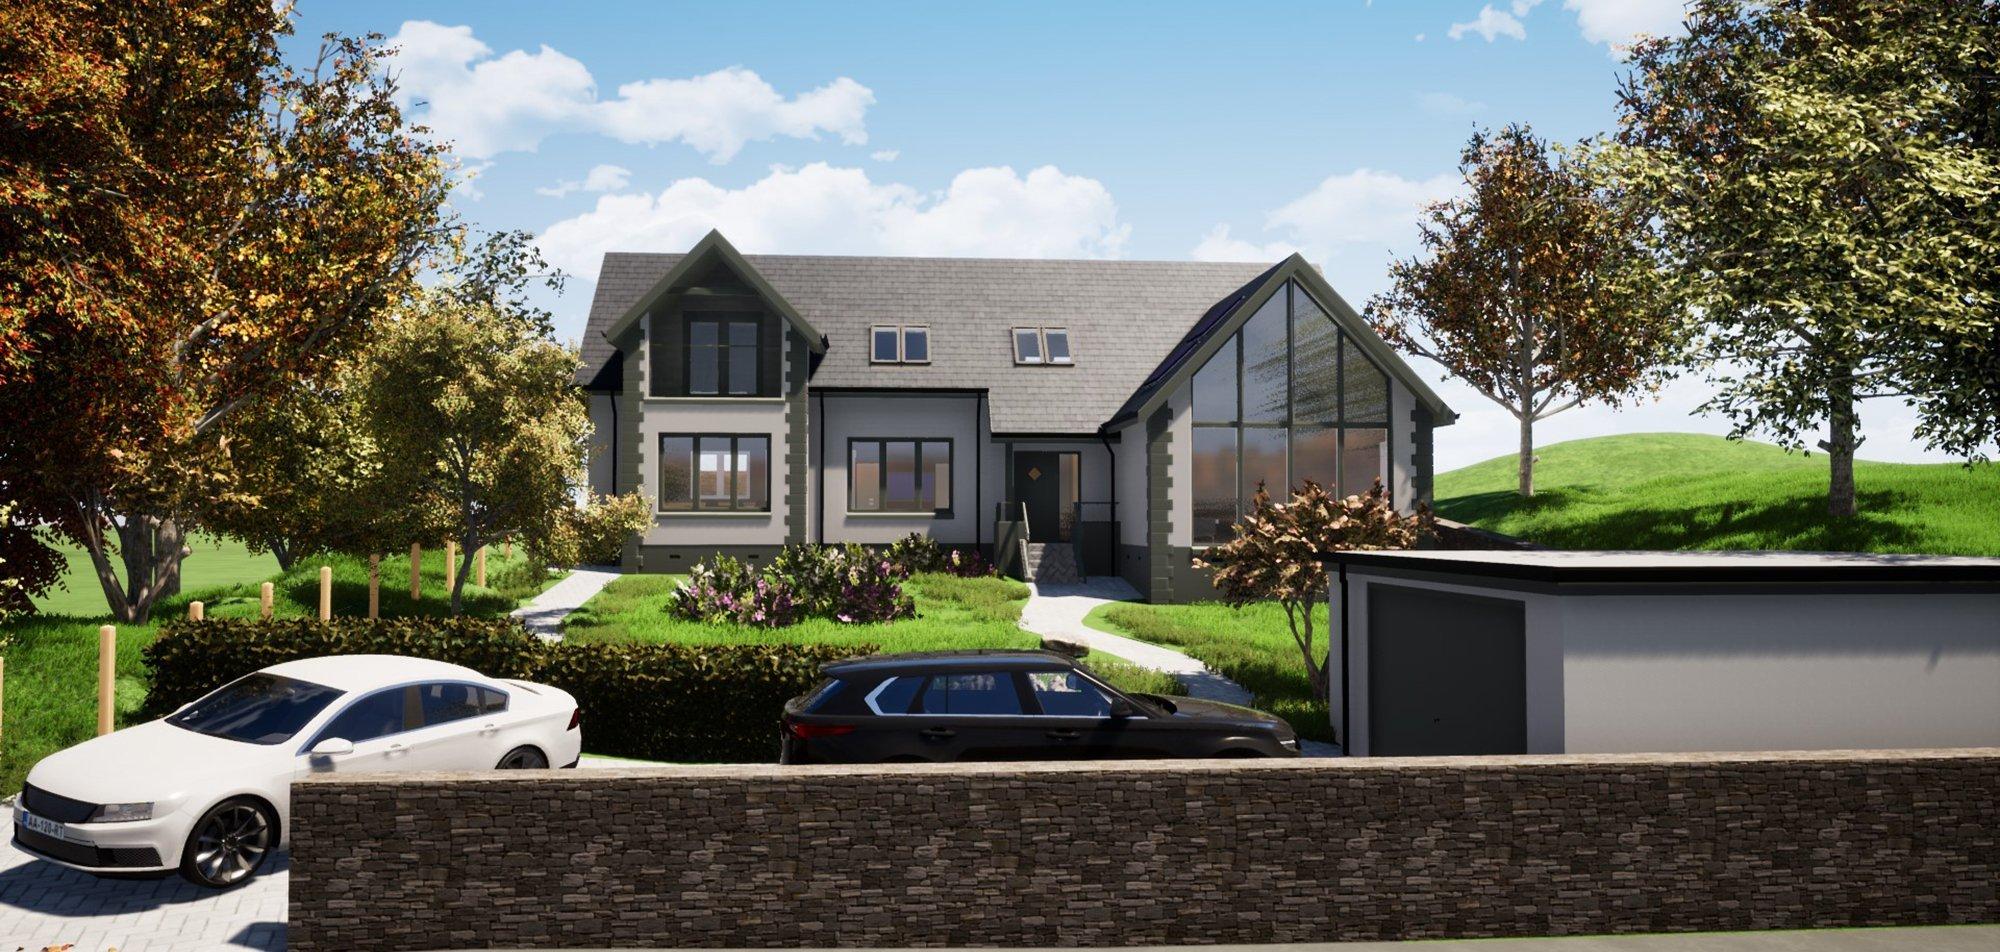 NEW HOUSE, NEW ALYTH